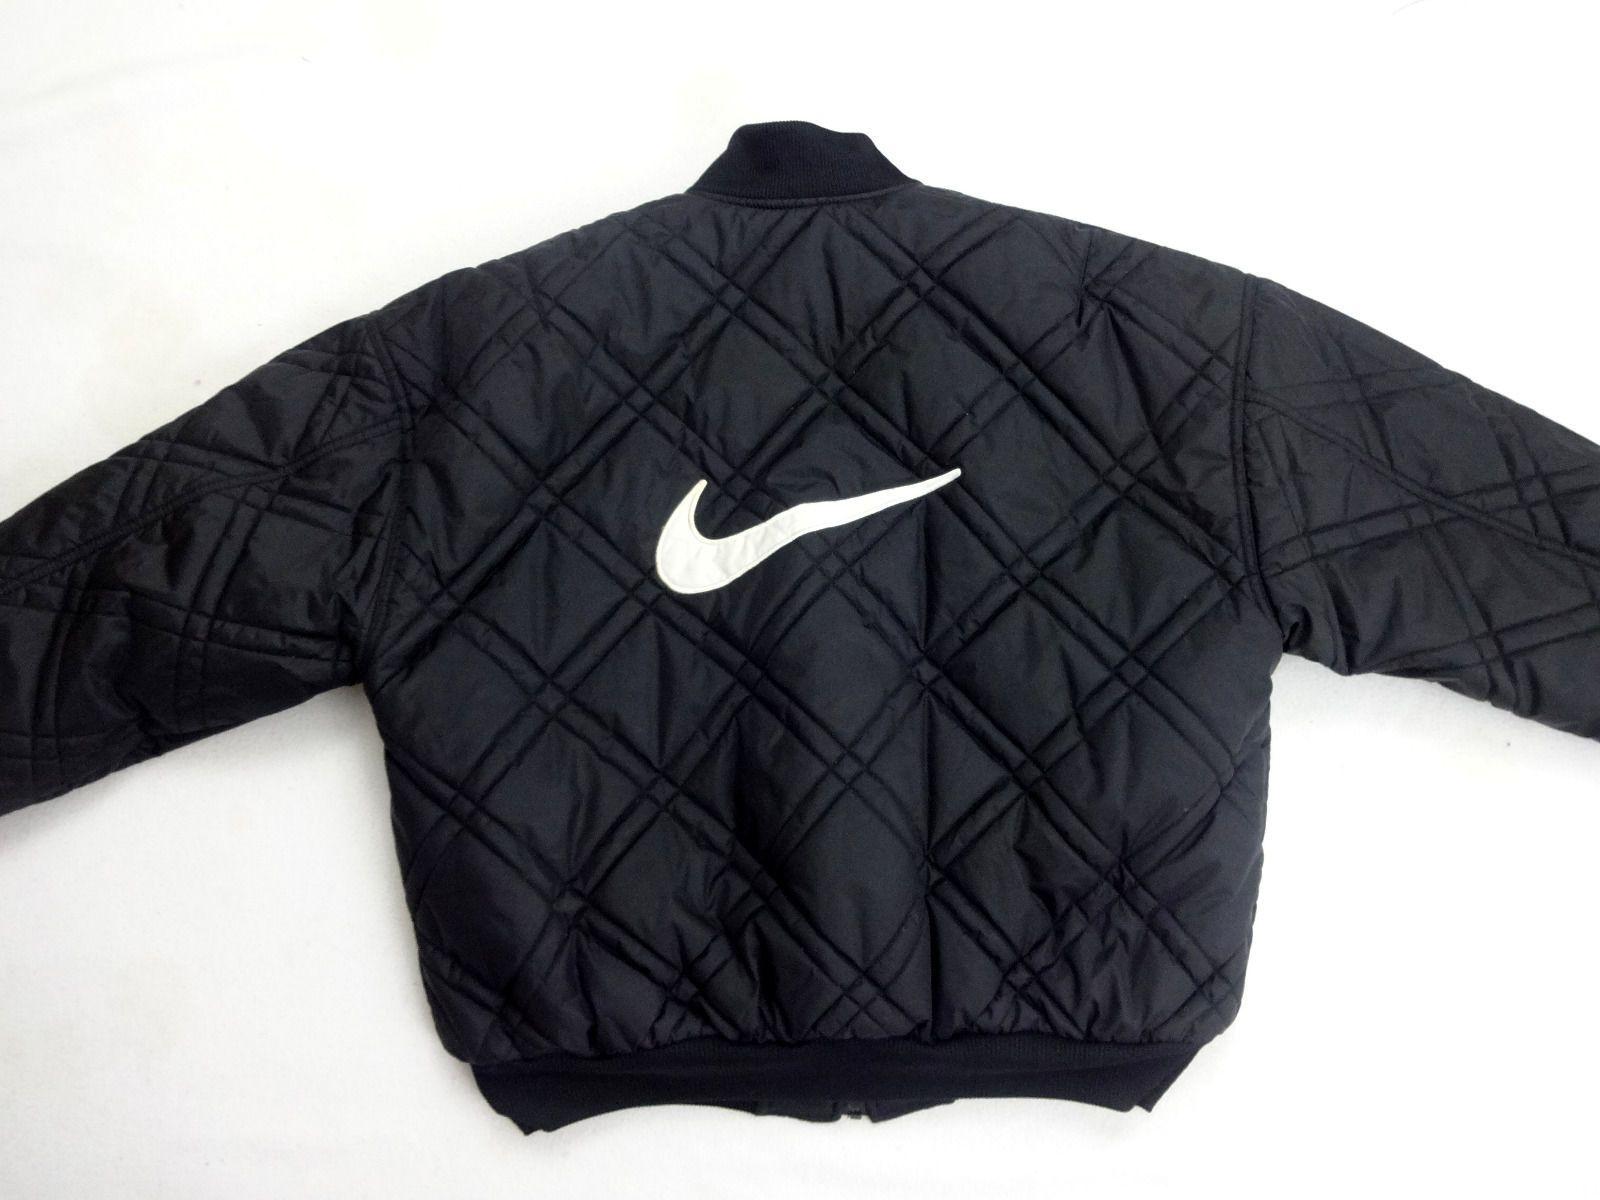 32cfdd3d27b5 Nike Men s Reversible Quilted Black Bomber Jacket Coat Large Swoosh 90s  Vintage